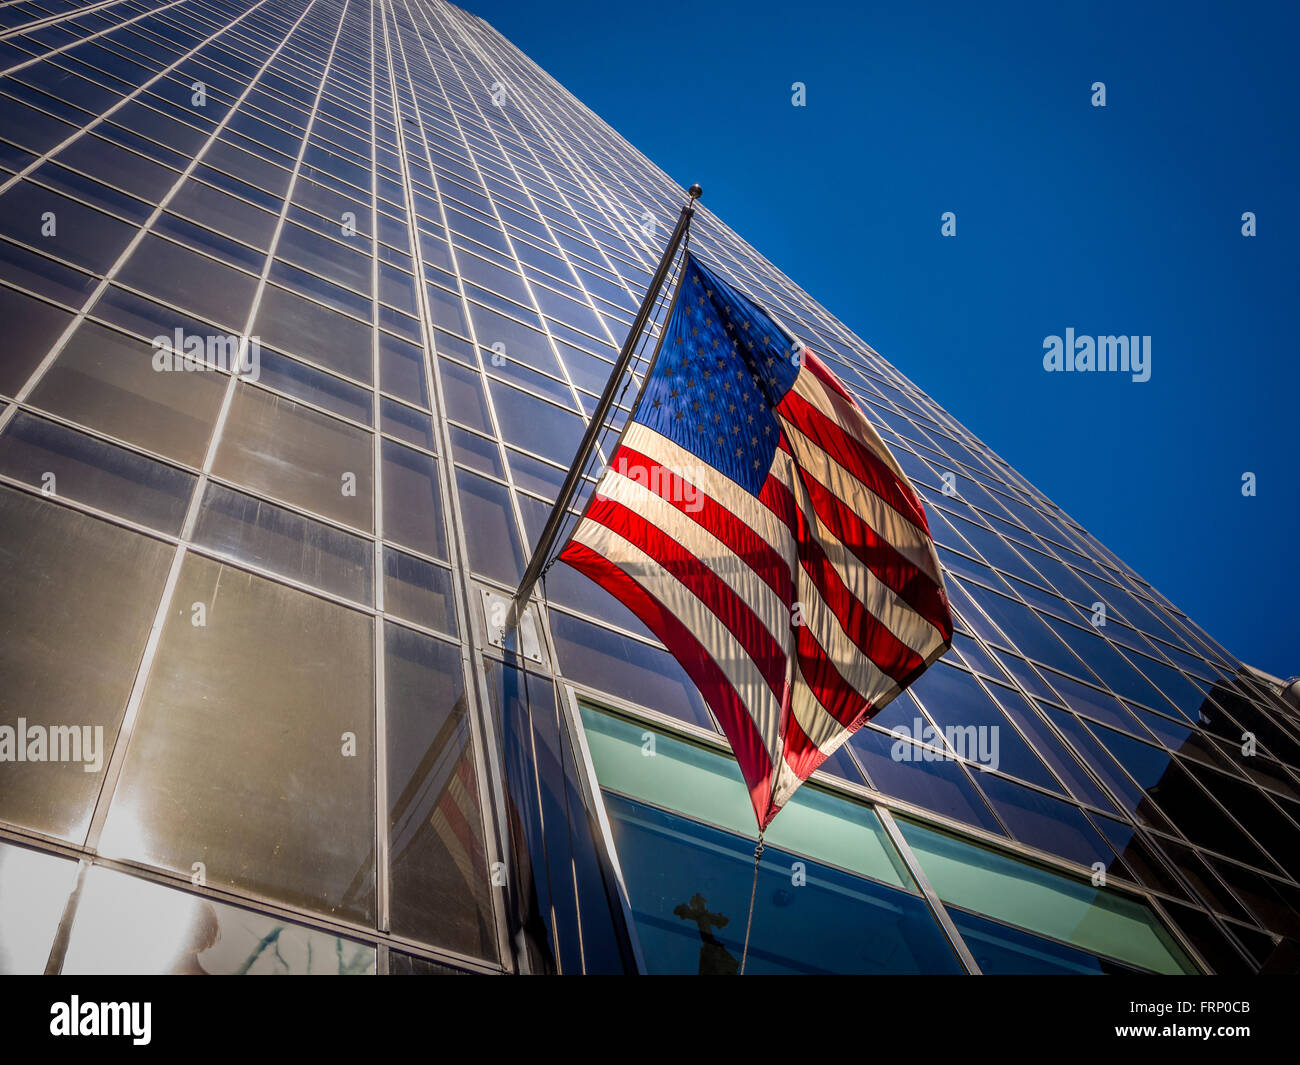 Stars and Stripes American Flag, New York City, USA. - Stock Image